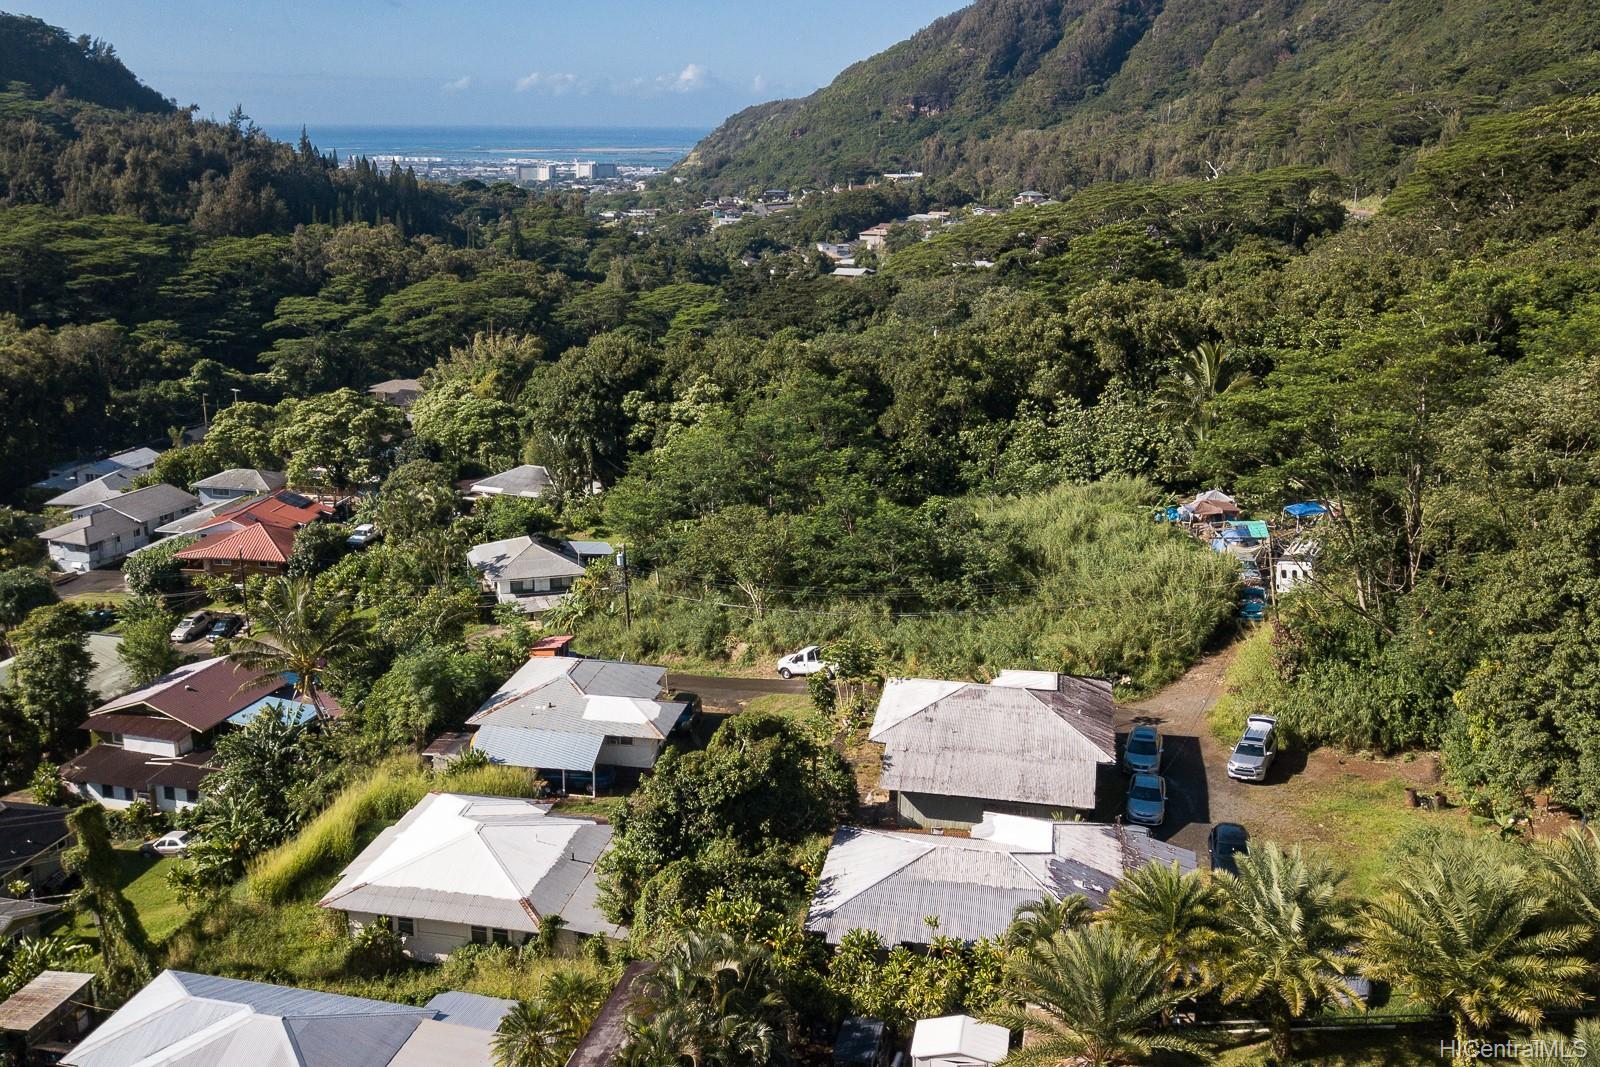 3434 Kalihi Street Honolulu - Multi-family - photo 5 of 20